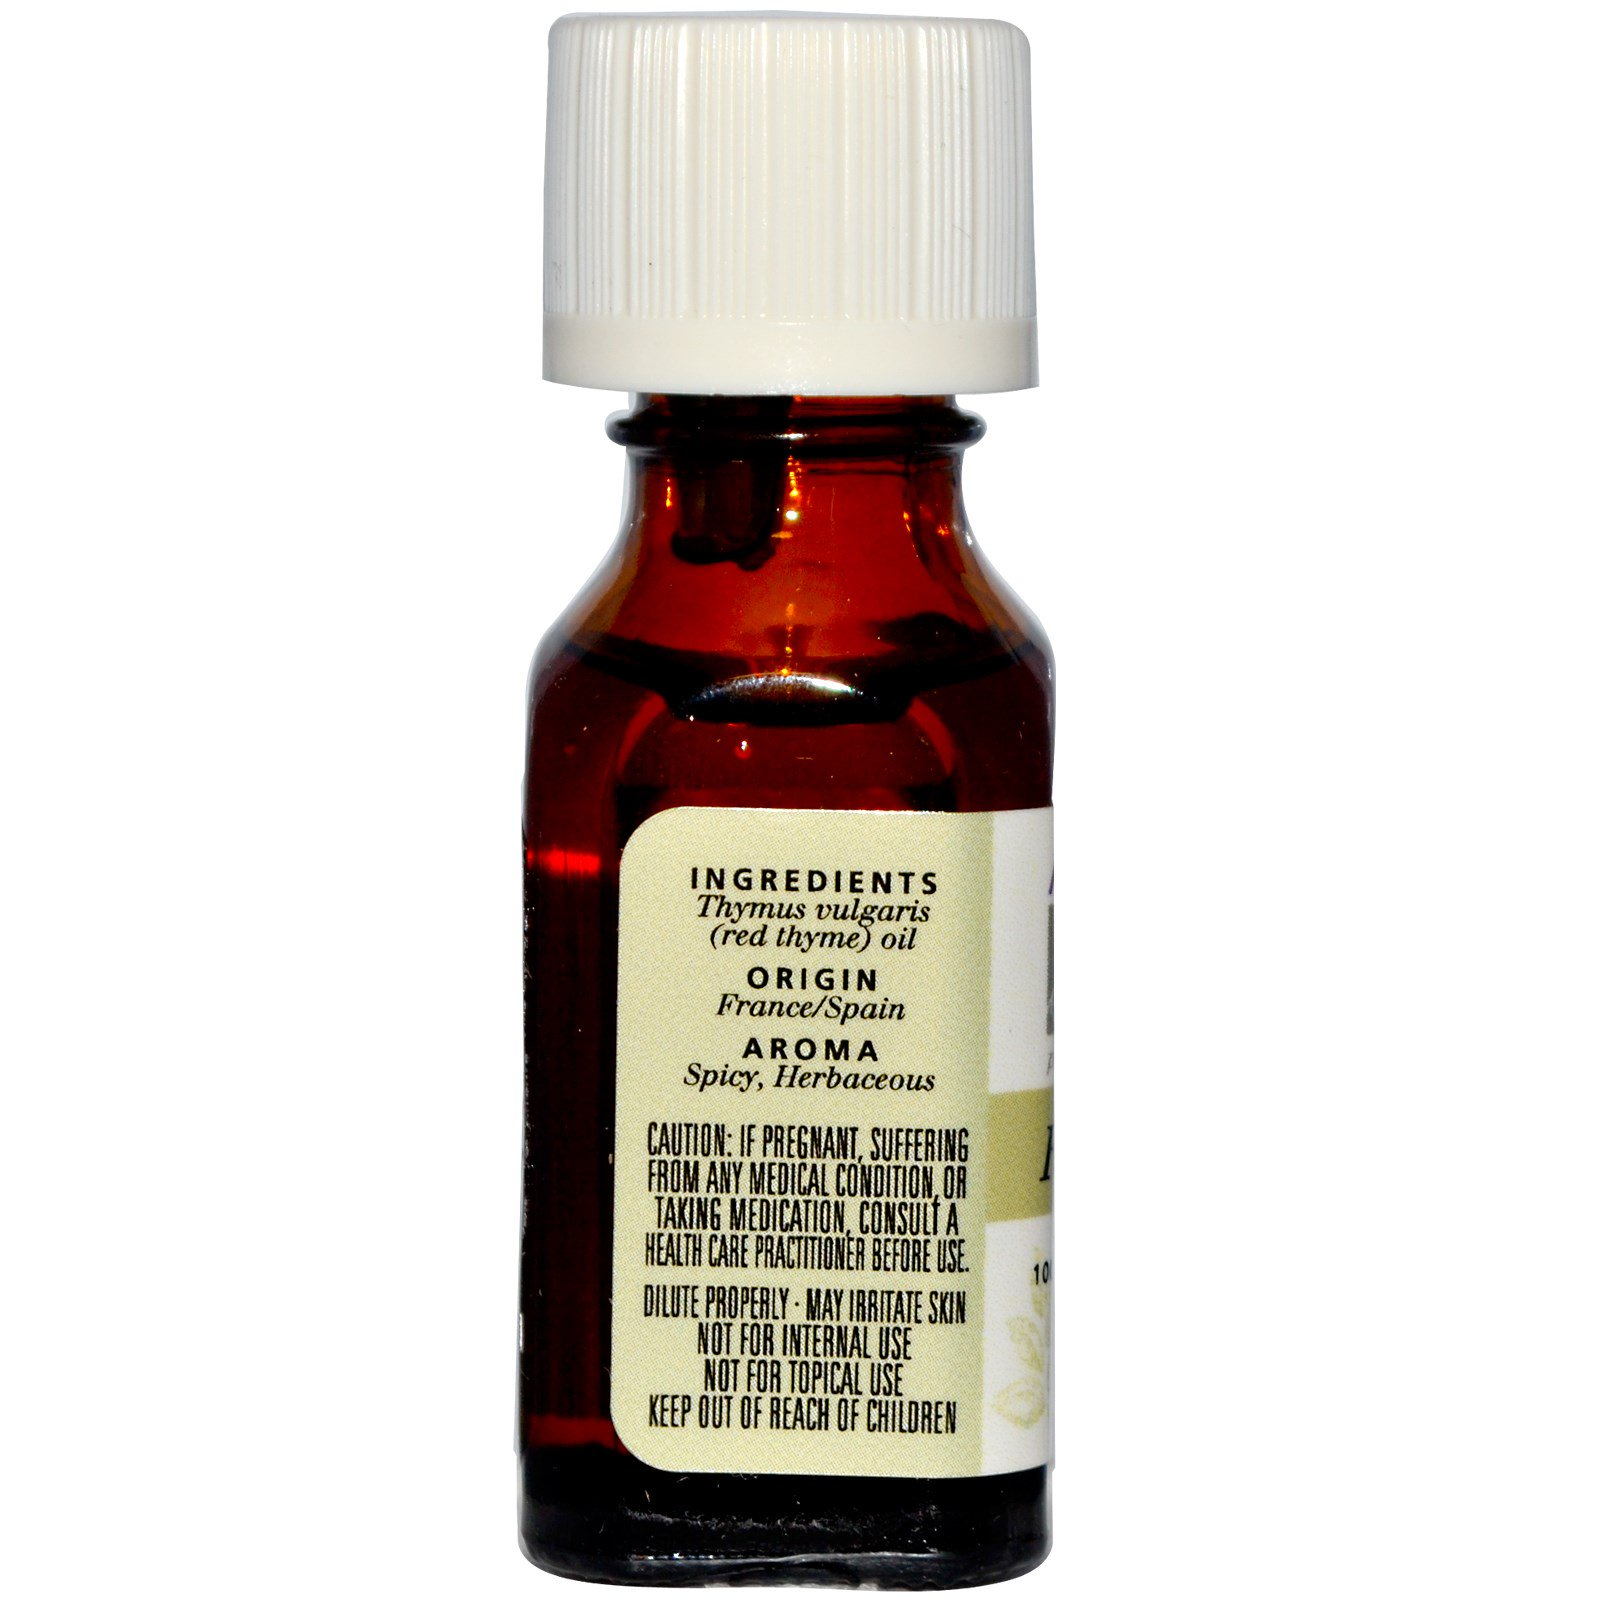 0.5 Fl Oz Aceite Esencial Tomillo Rojo thymus Vulgaris